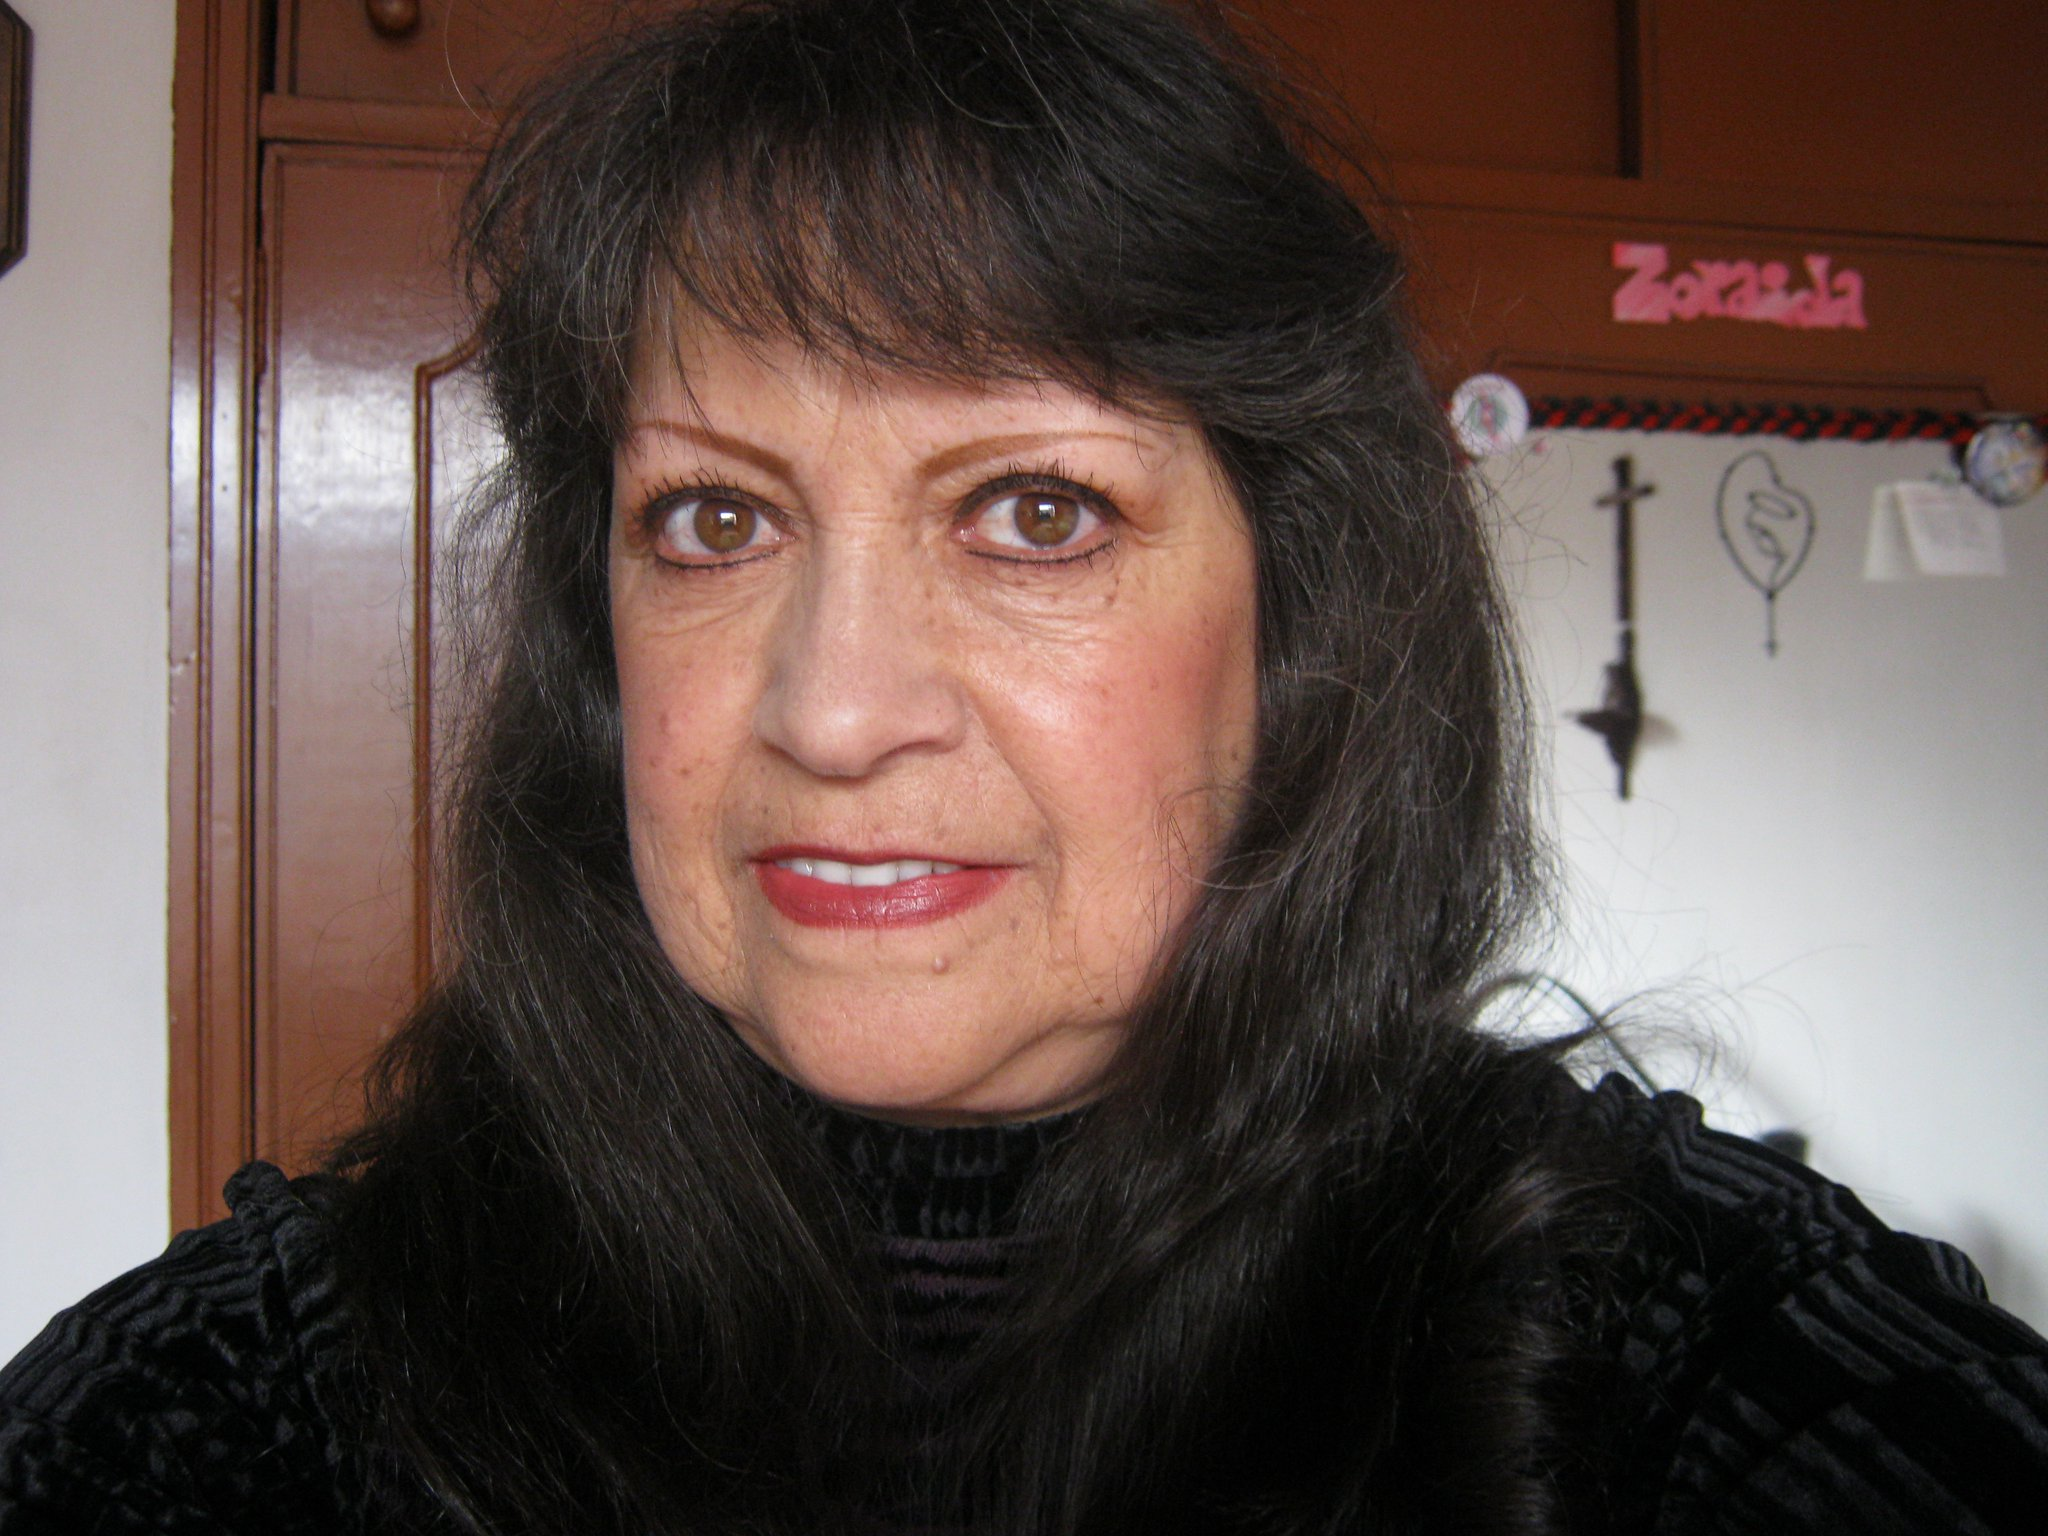 Zoraida Duque